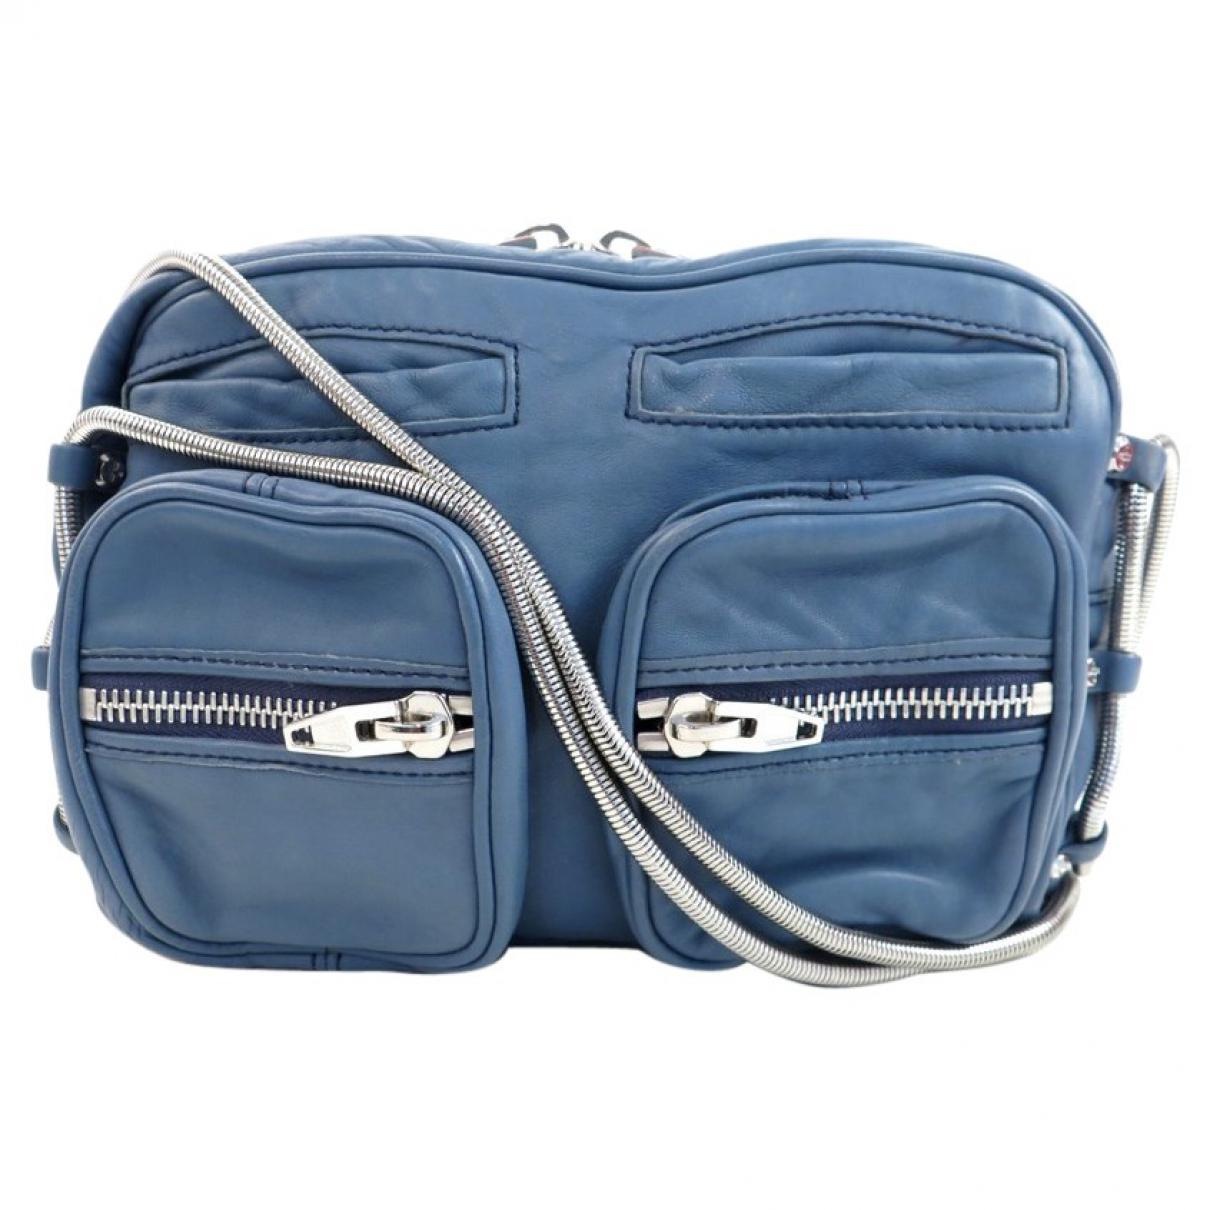 Pre-owned - Brenda leather handbag Alexander Wang OeZaeHXdH8